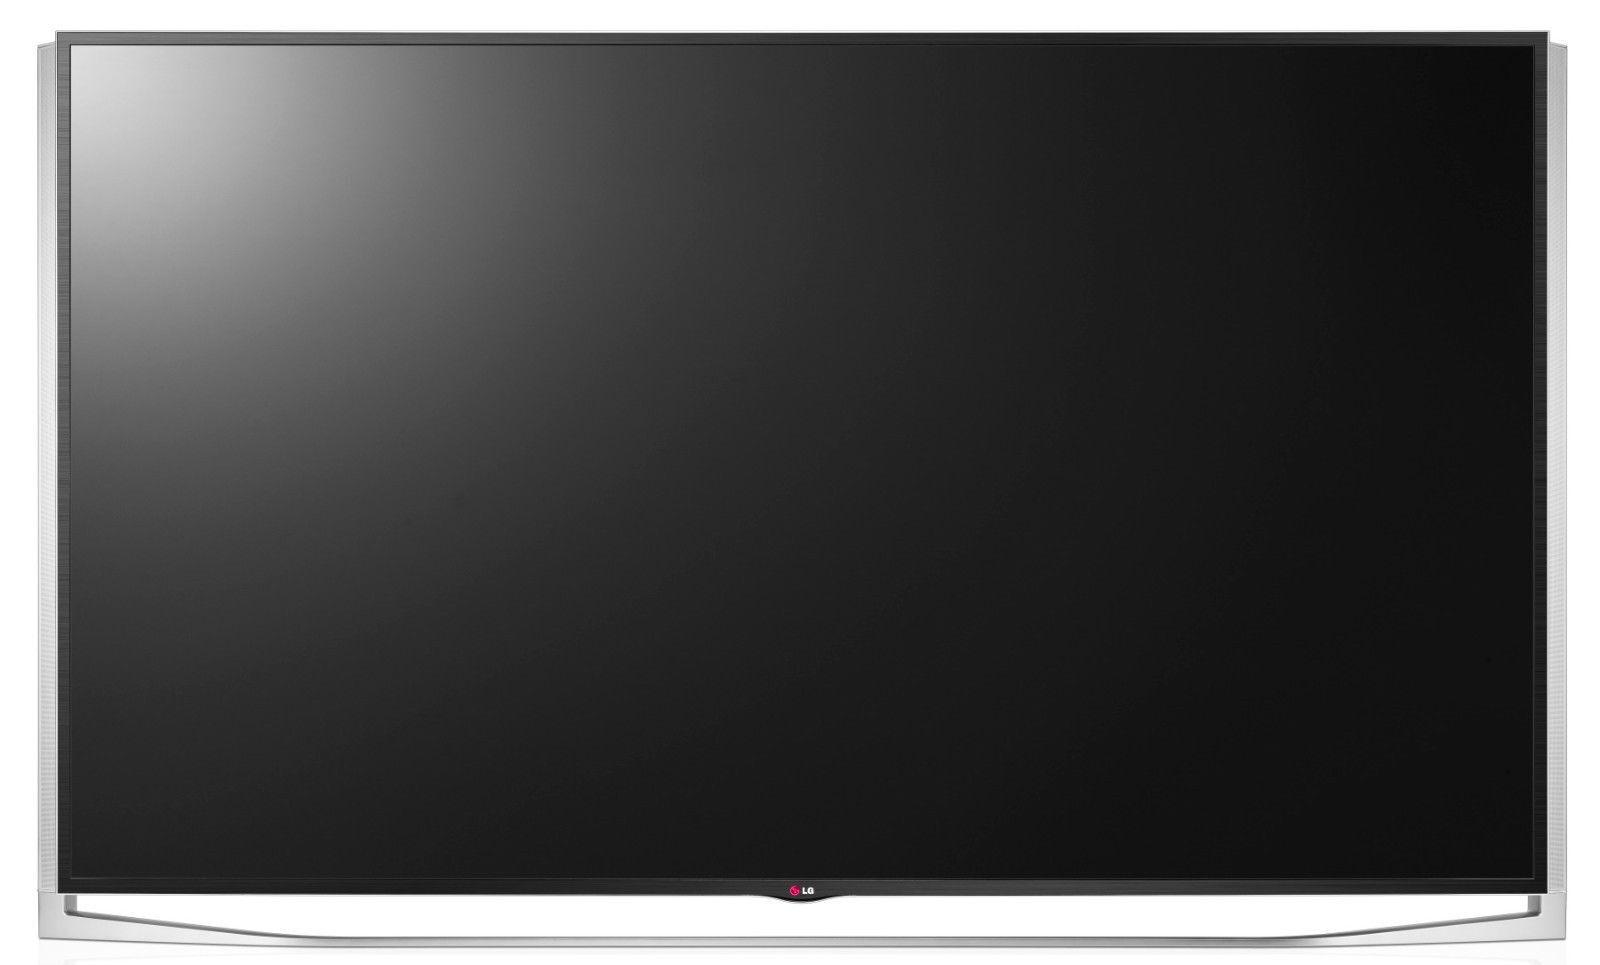 hitachi 65hl6t64u 65 inch 4k ultra hd smart tv. lg 79ub9800 3d ultra hd, 79 inch 4k tv hitachi 65hl6t64u 65 hd smart tv 4